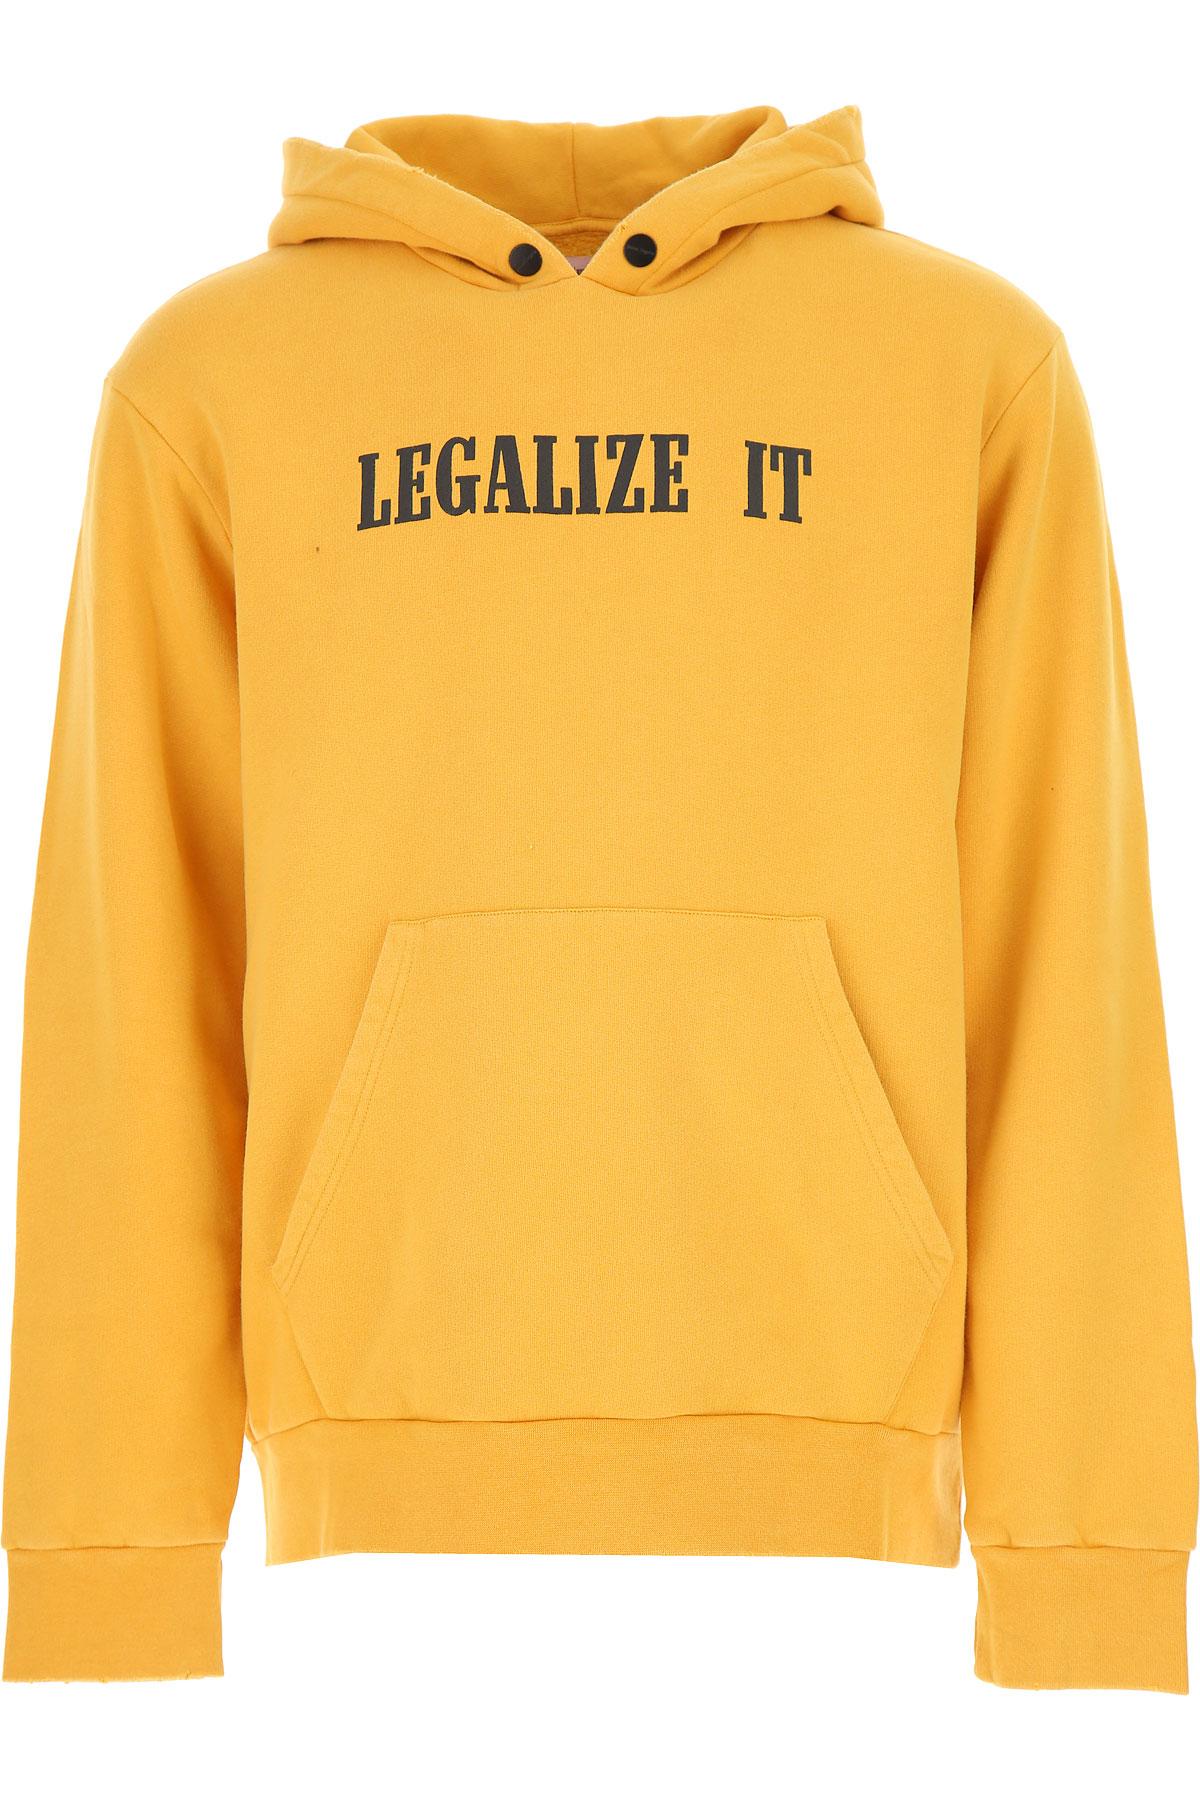 Palm Angels Sweatshirt for Men, Light Orange, Cotton, 2017, L M XL USA-476666